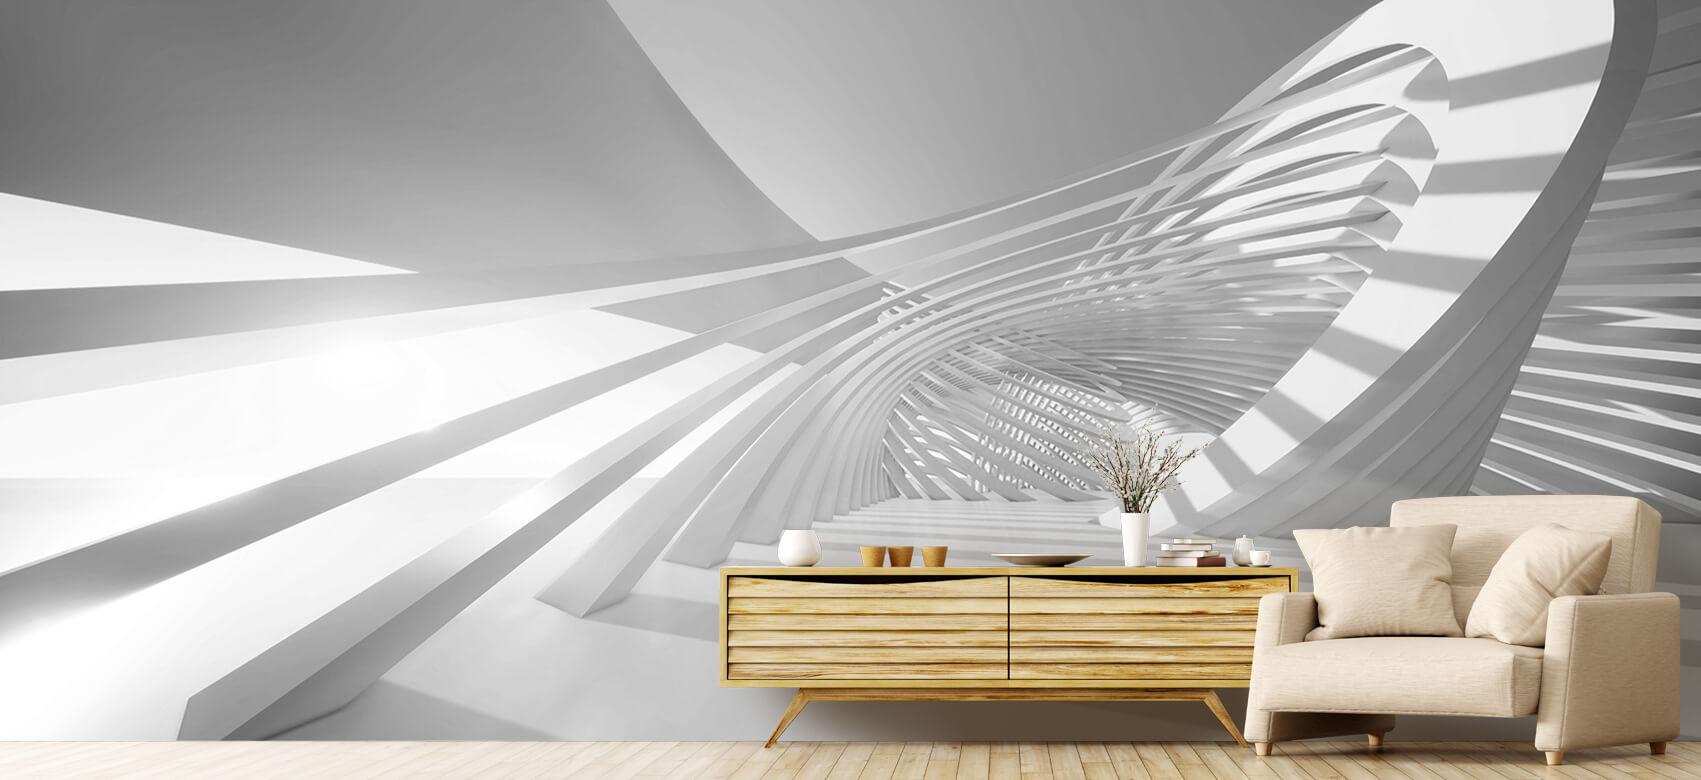 3D Anneaux abstraits 7